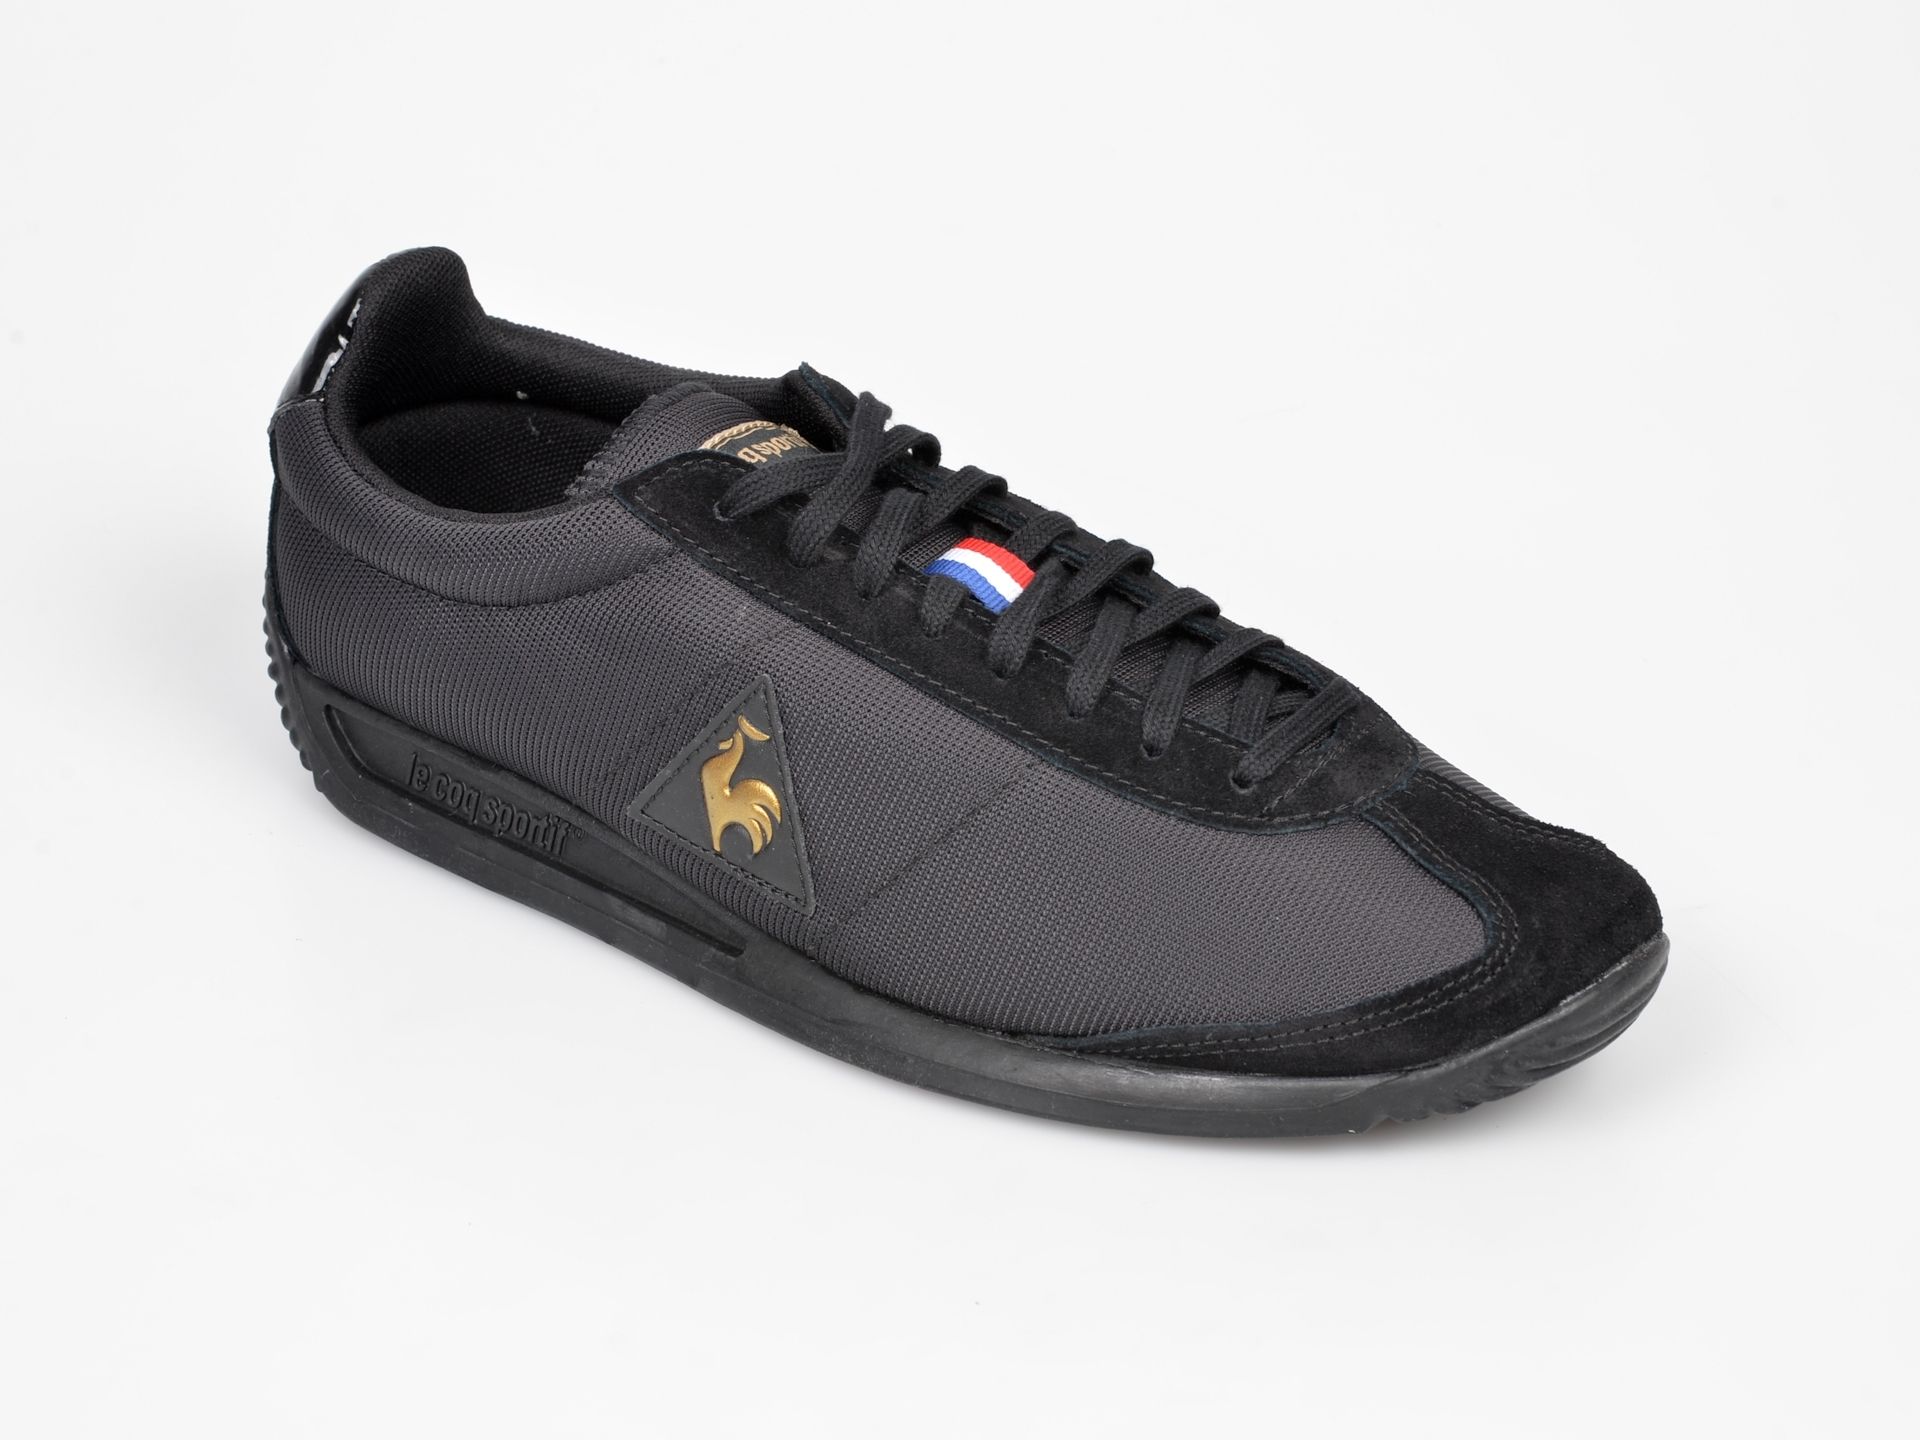 Pantofi Sport Le Coq Sportif Negri, 1920263, Din Material Textil